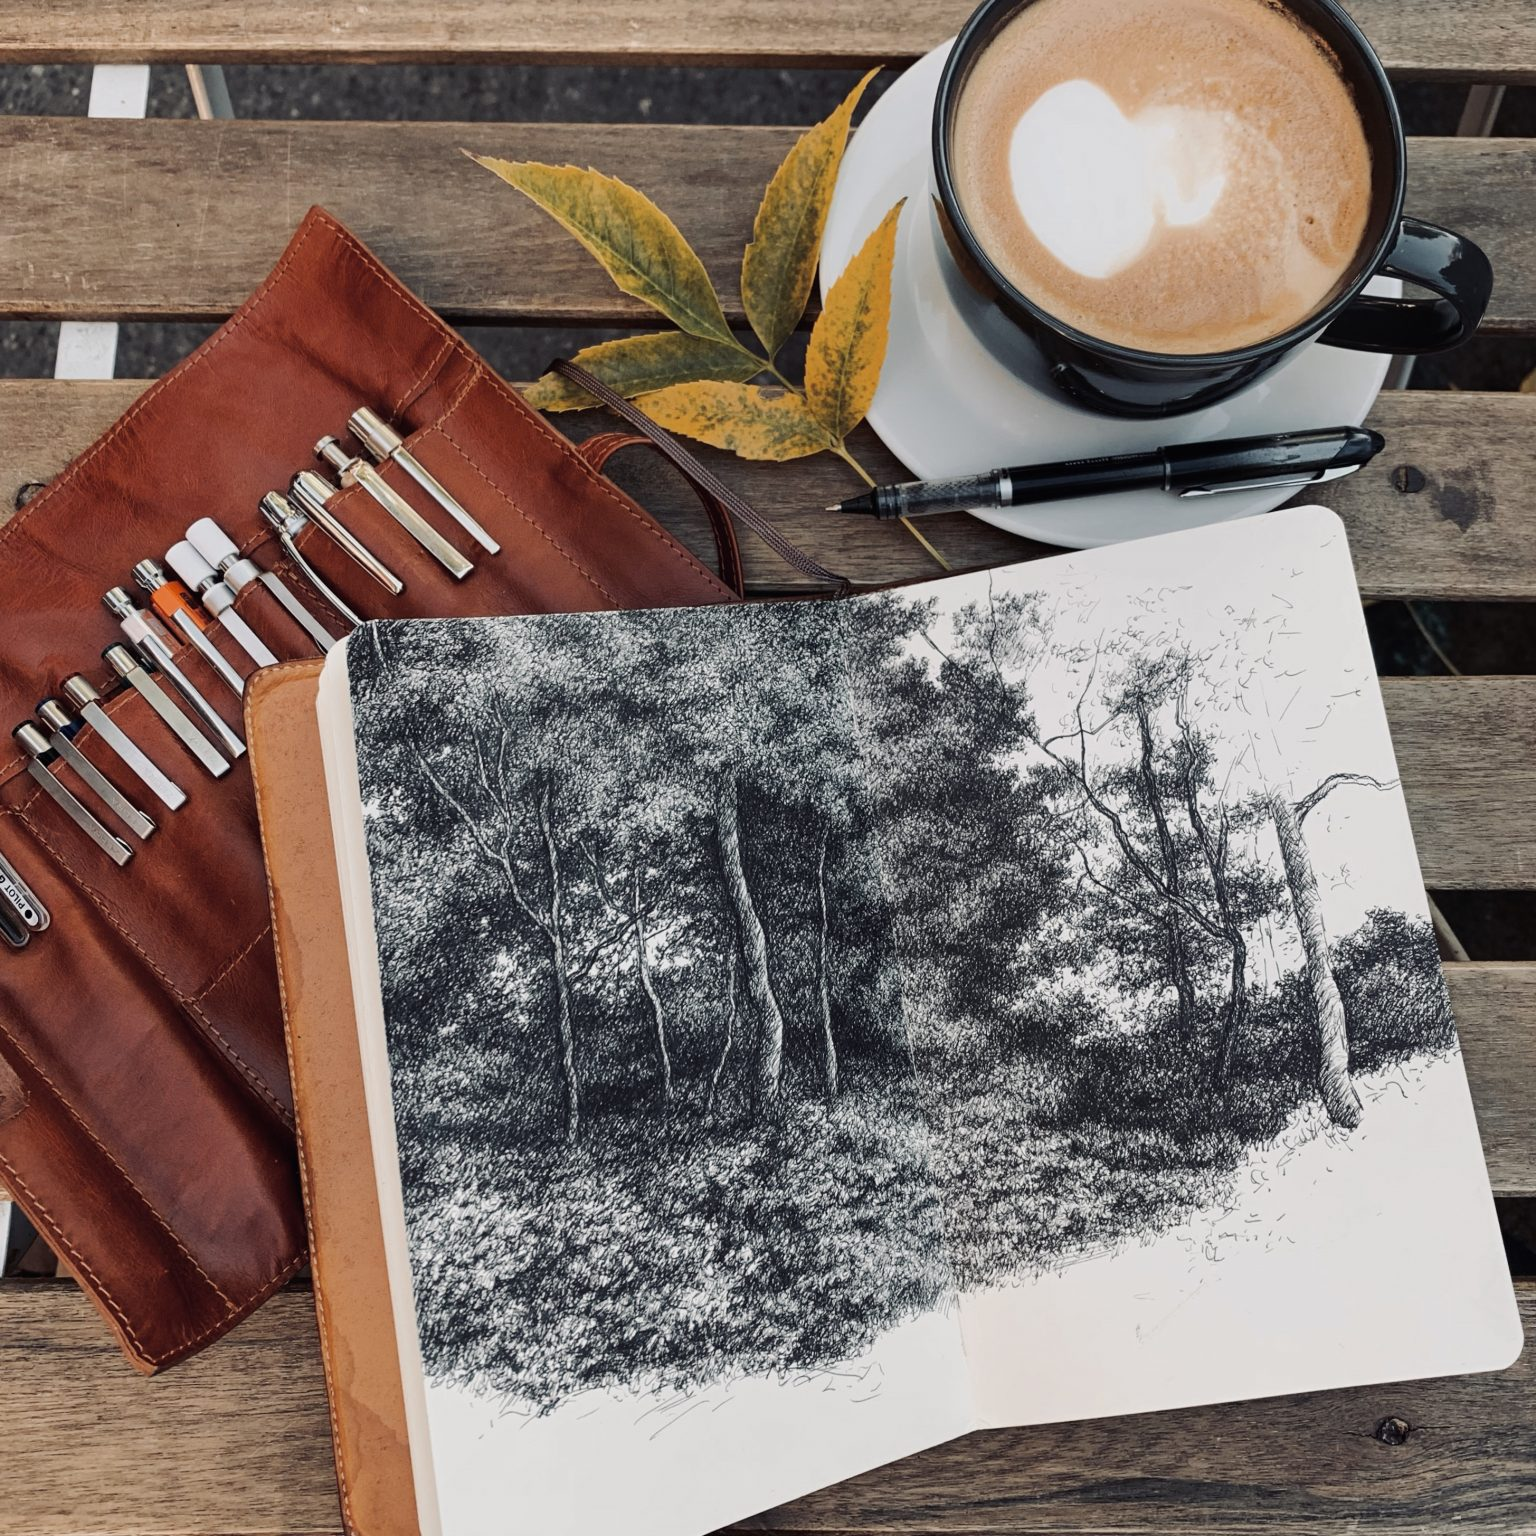 Coffee and Ink 57DB1D43-4879-4207-8813-F97B954109F36CF2A981-F184-4AED-9192-FE5E7AD2A44653D8ADD2-C751